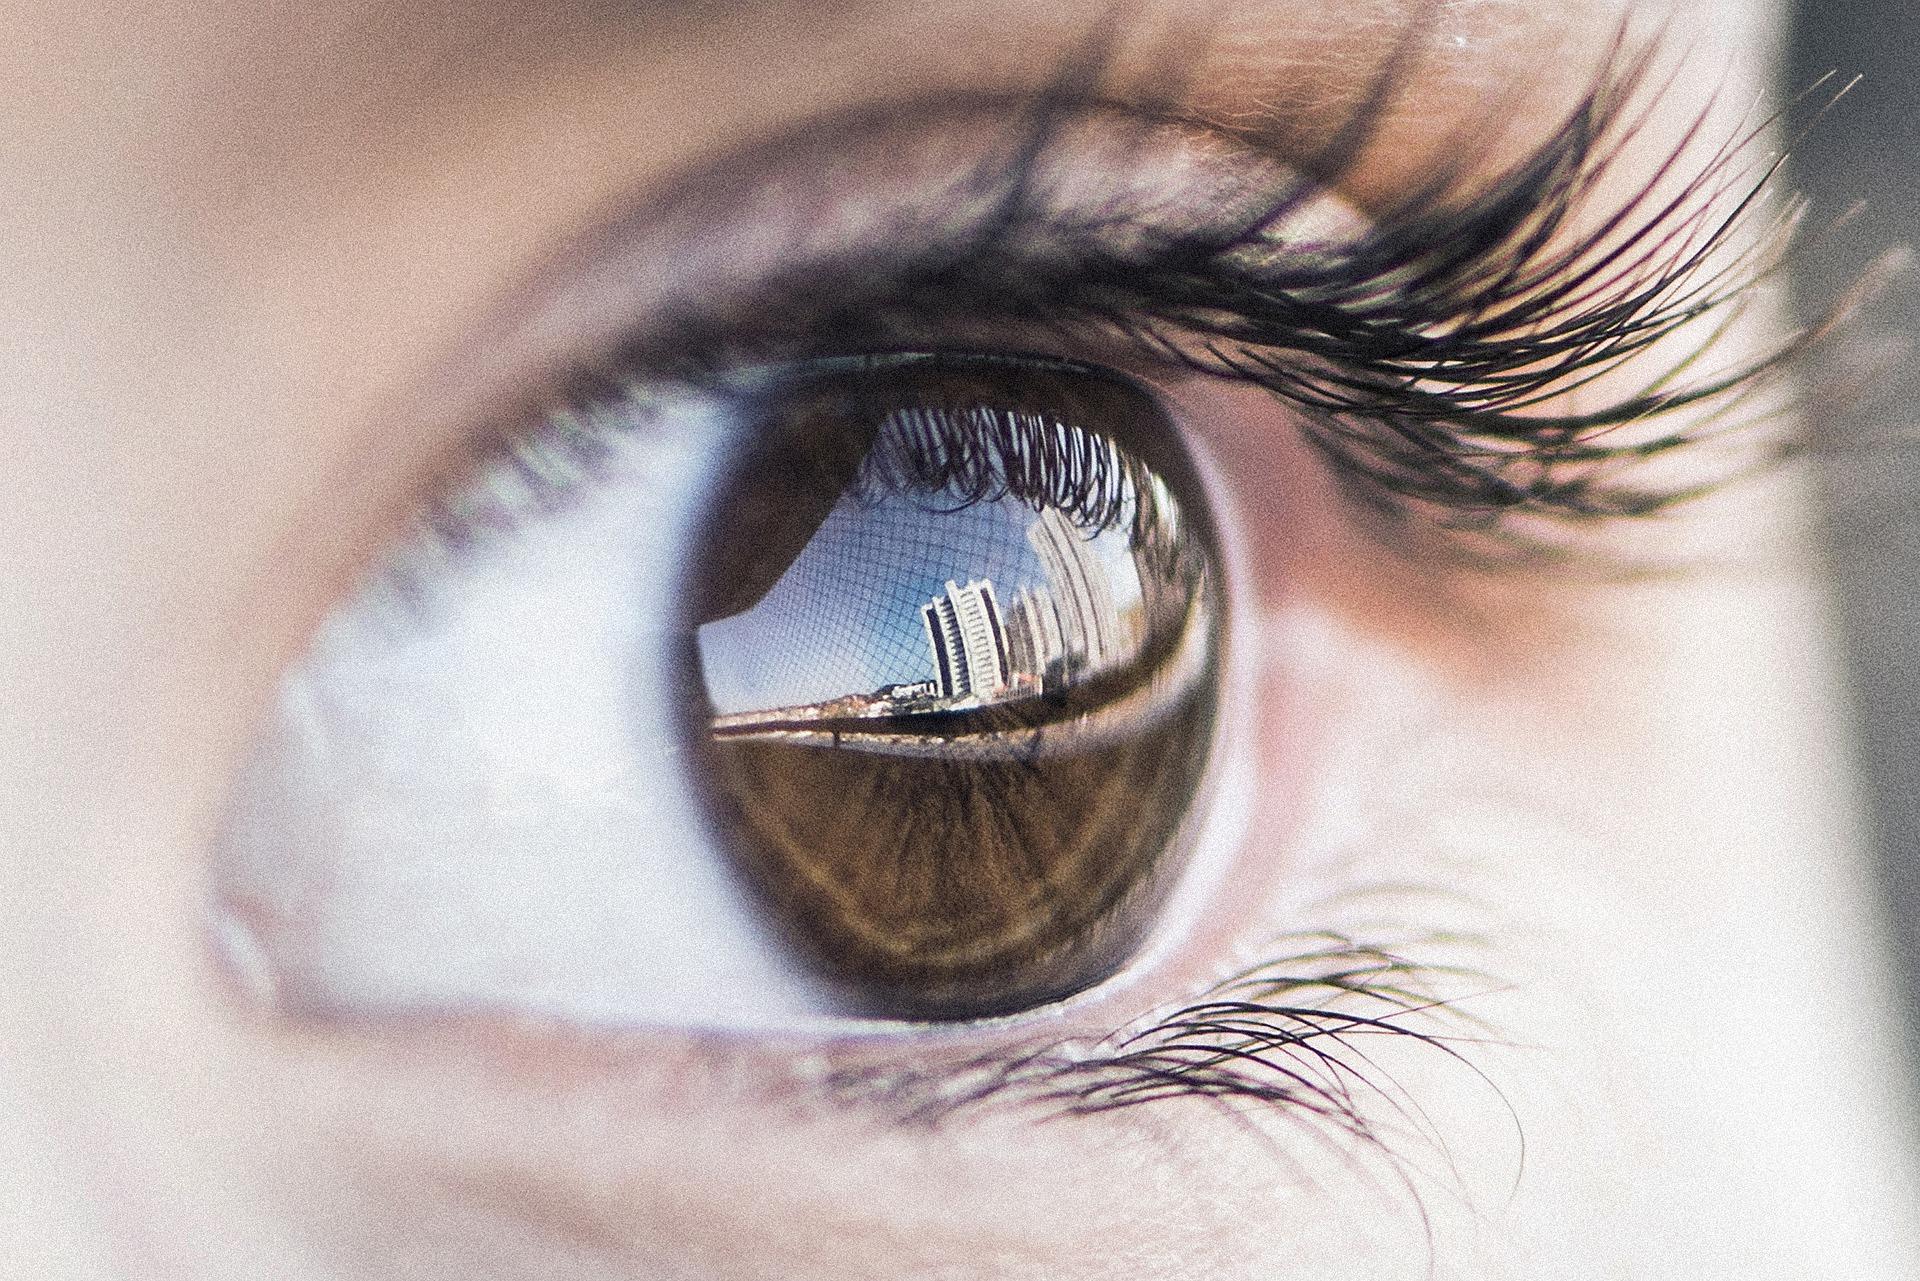 regard-cil-yeux